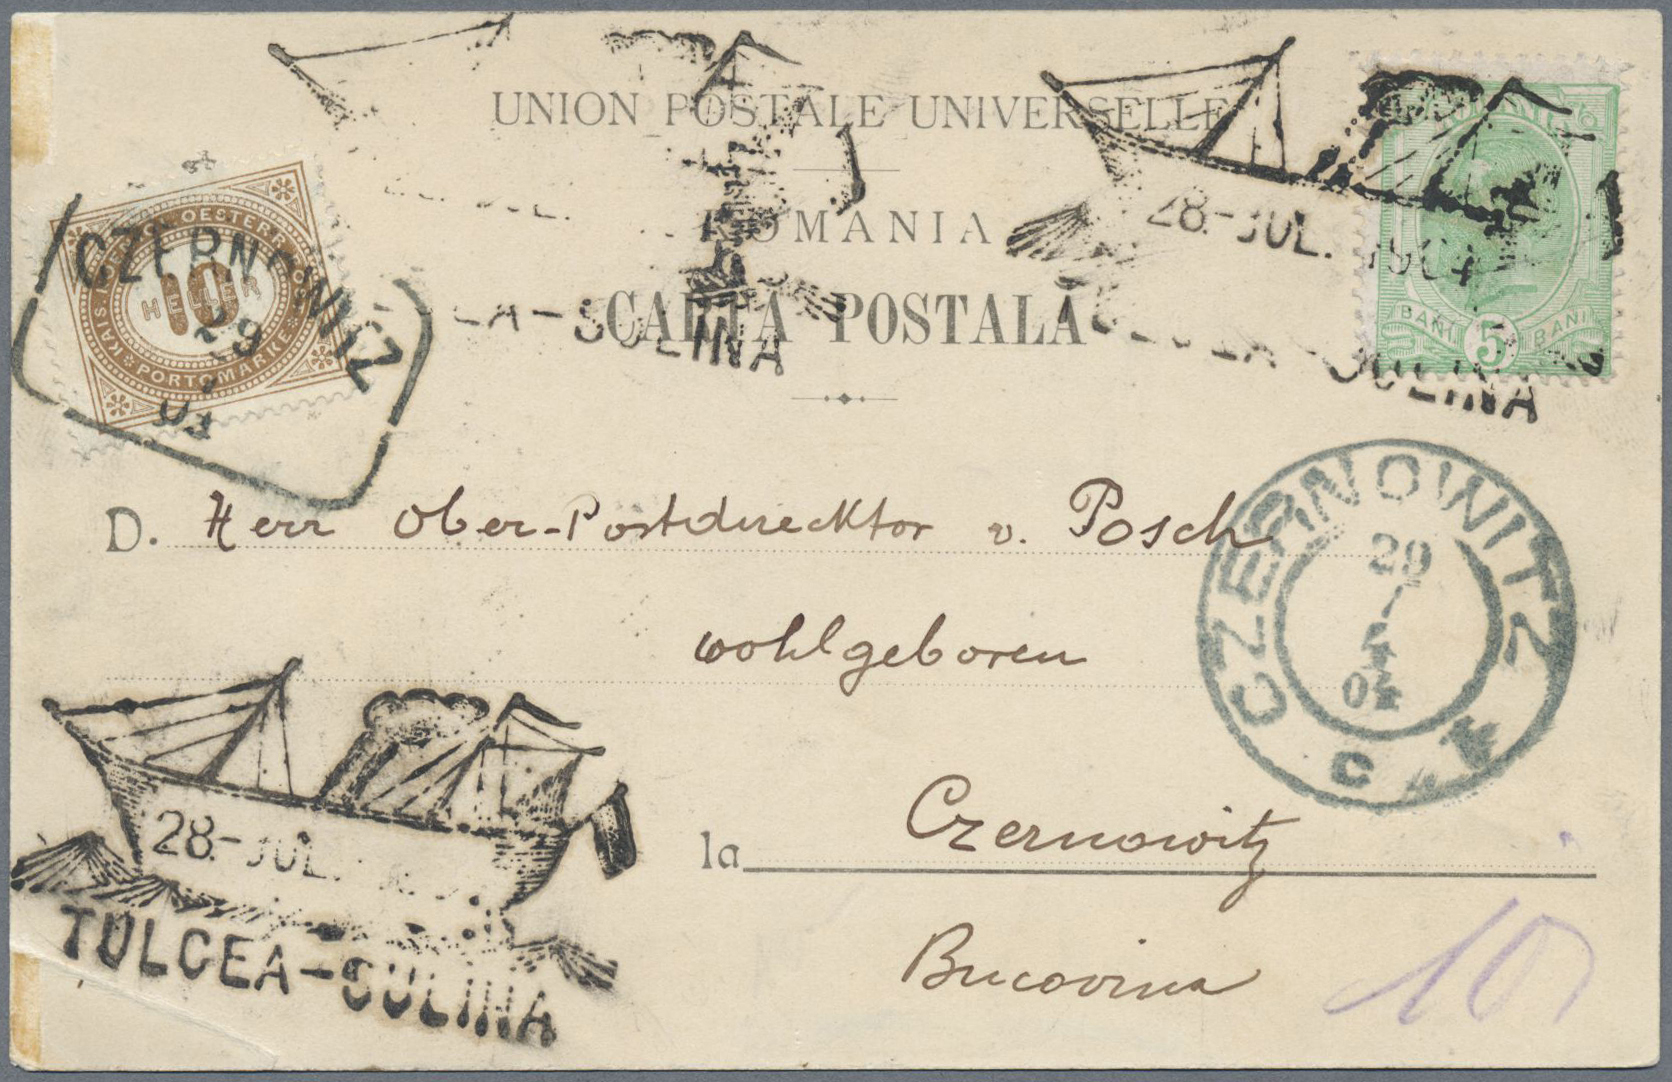 Lot 18452 - Rumänien - Stempel  -  Auktionshaus Christoph Gärtner GmbH & Co. KG Single lots Philately Overseas & Europe. Auction #39 Day 4